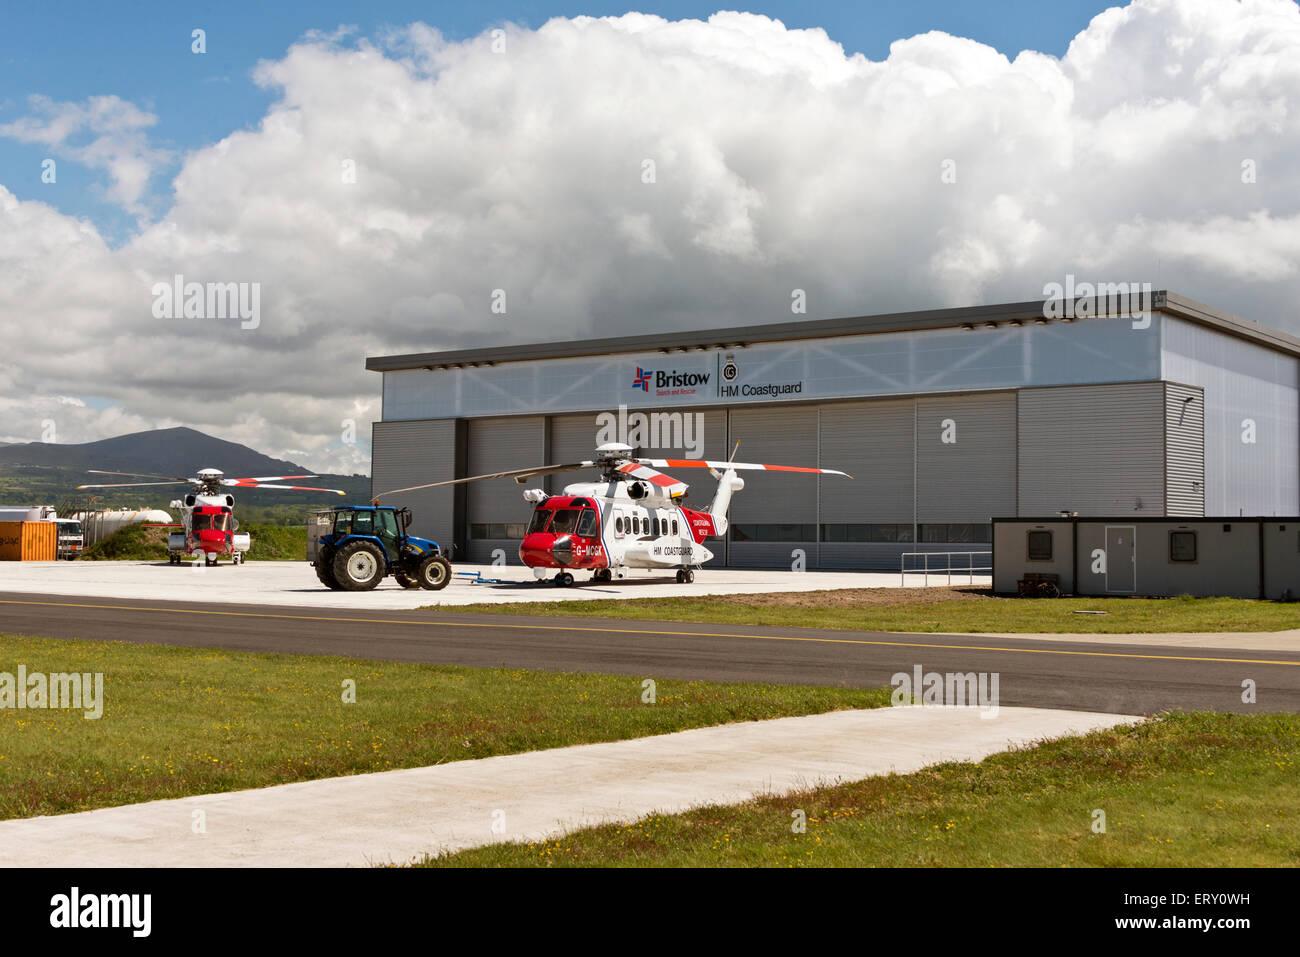 G-MCGE Sikorsky S92A H.M.Coastguard search and rescue Caernarfon Caernarvon Airport North Wales Uk Stock Photo